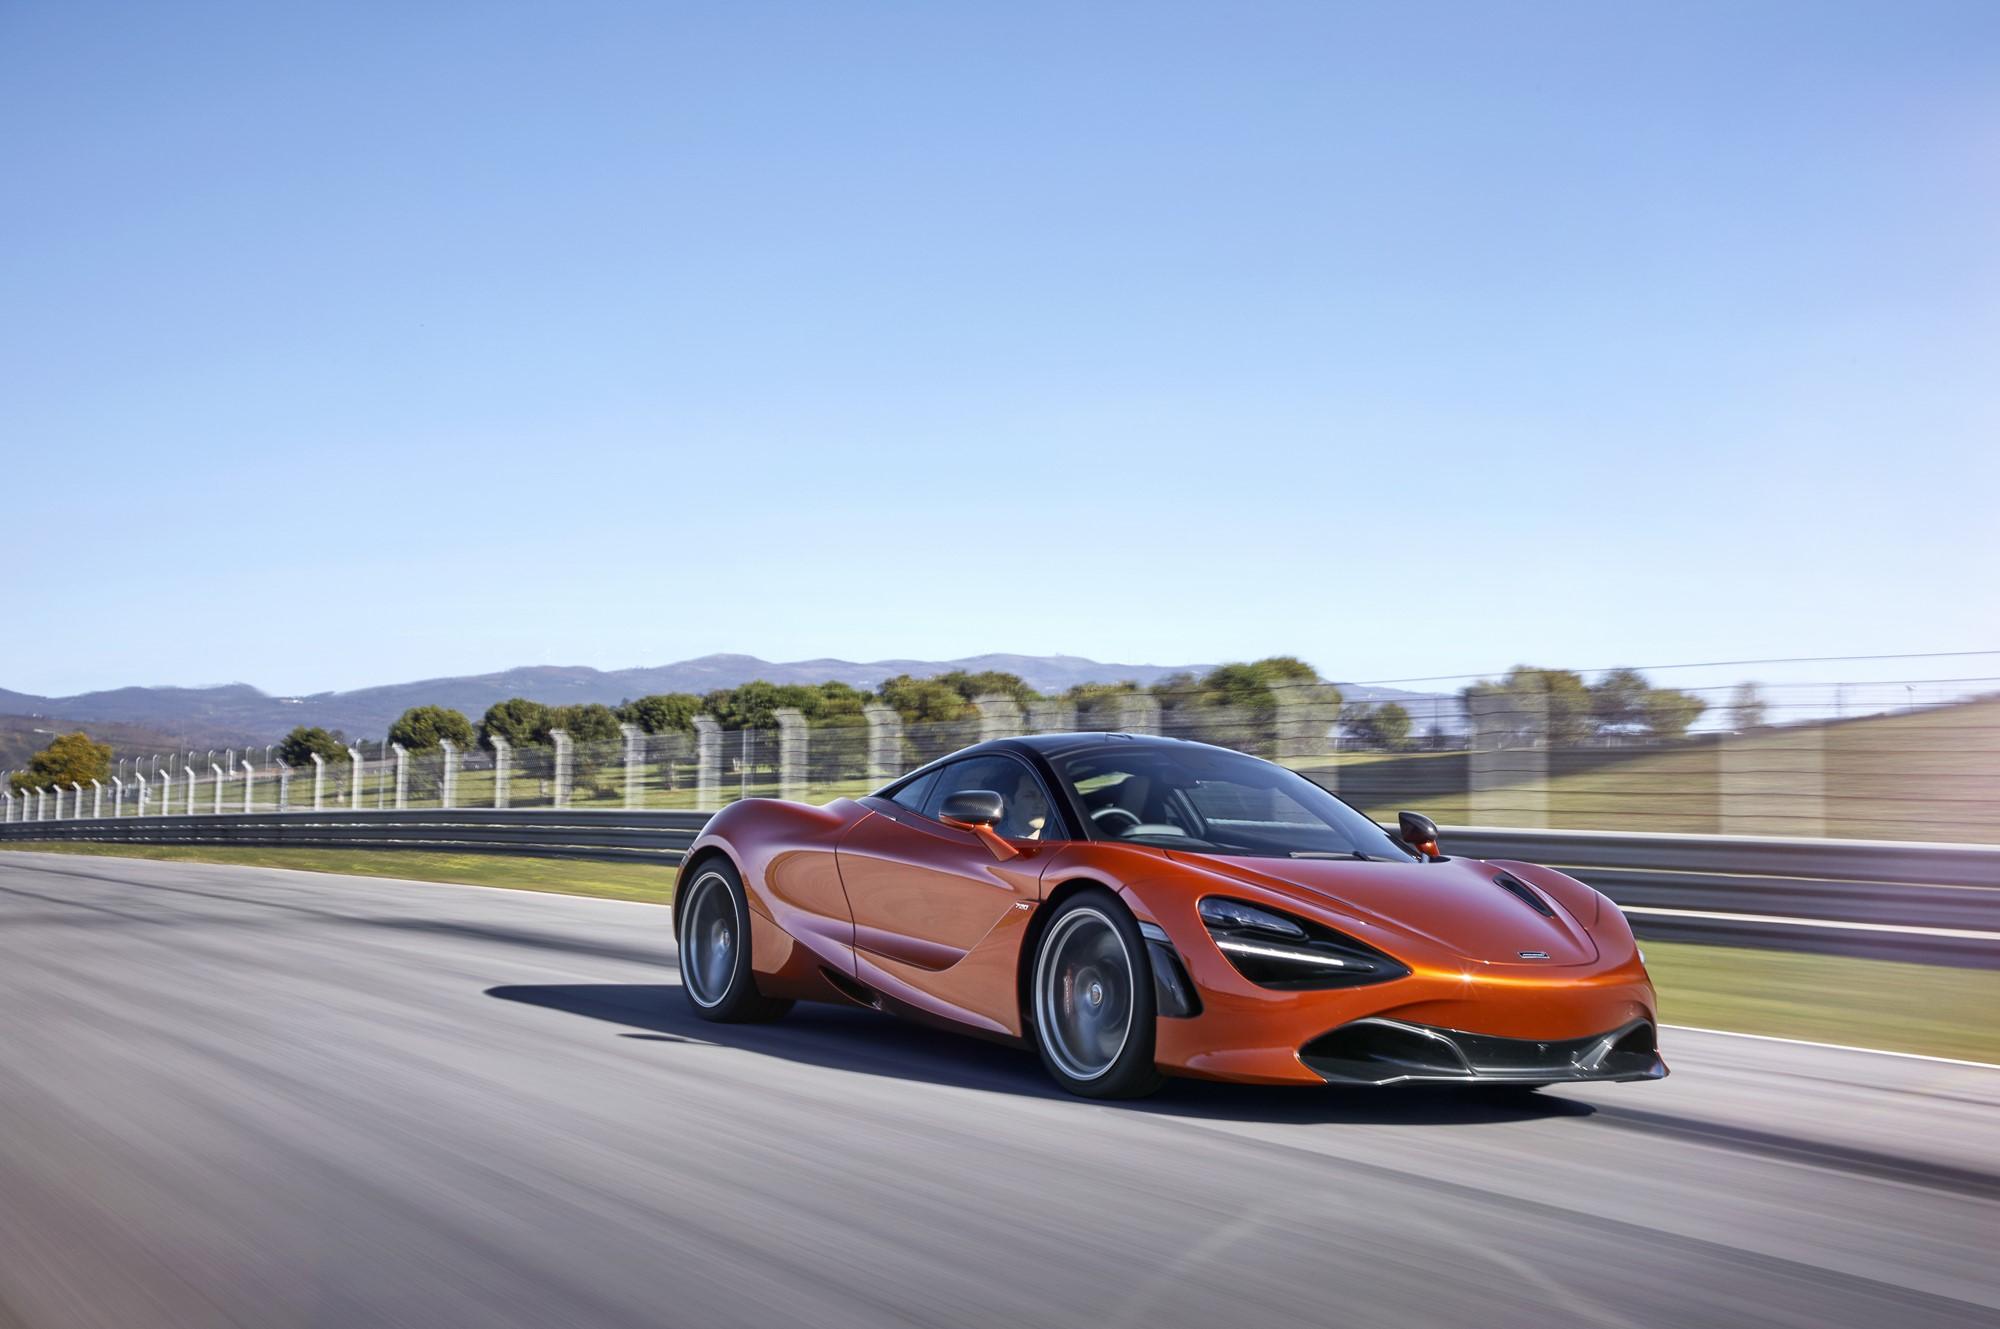 McLaren images